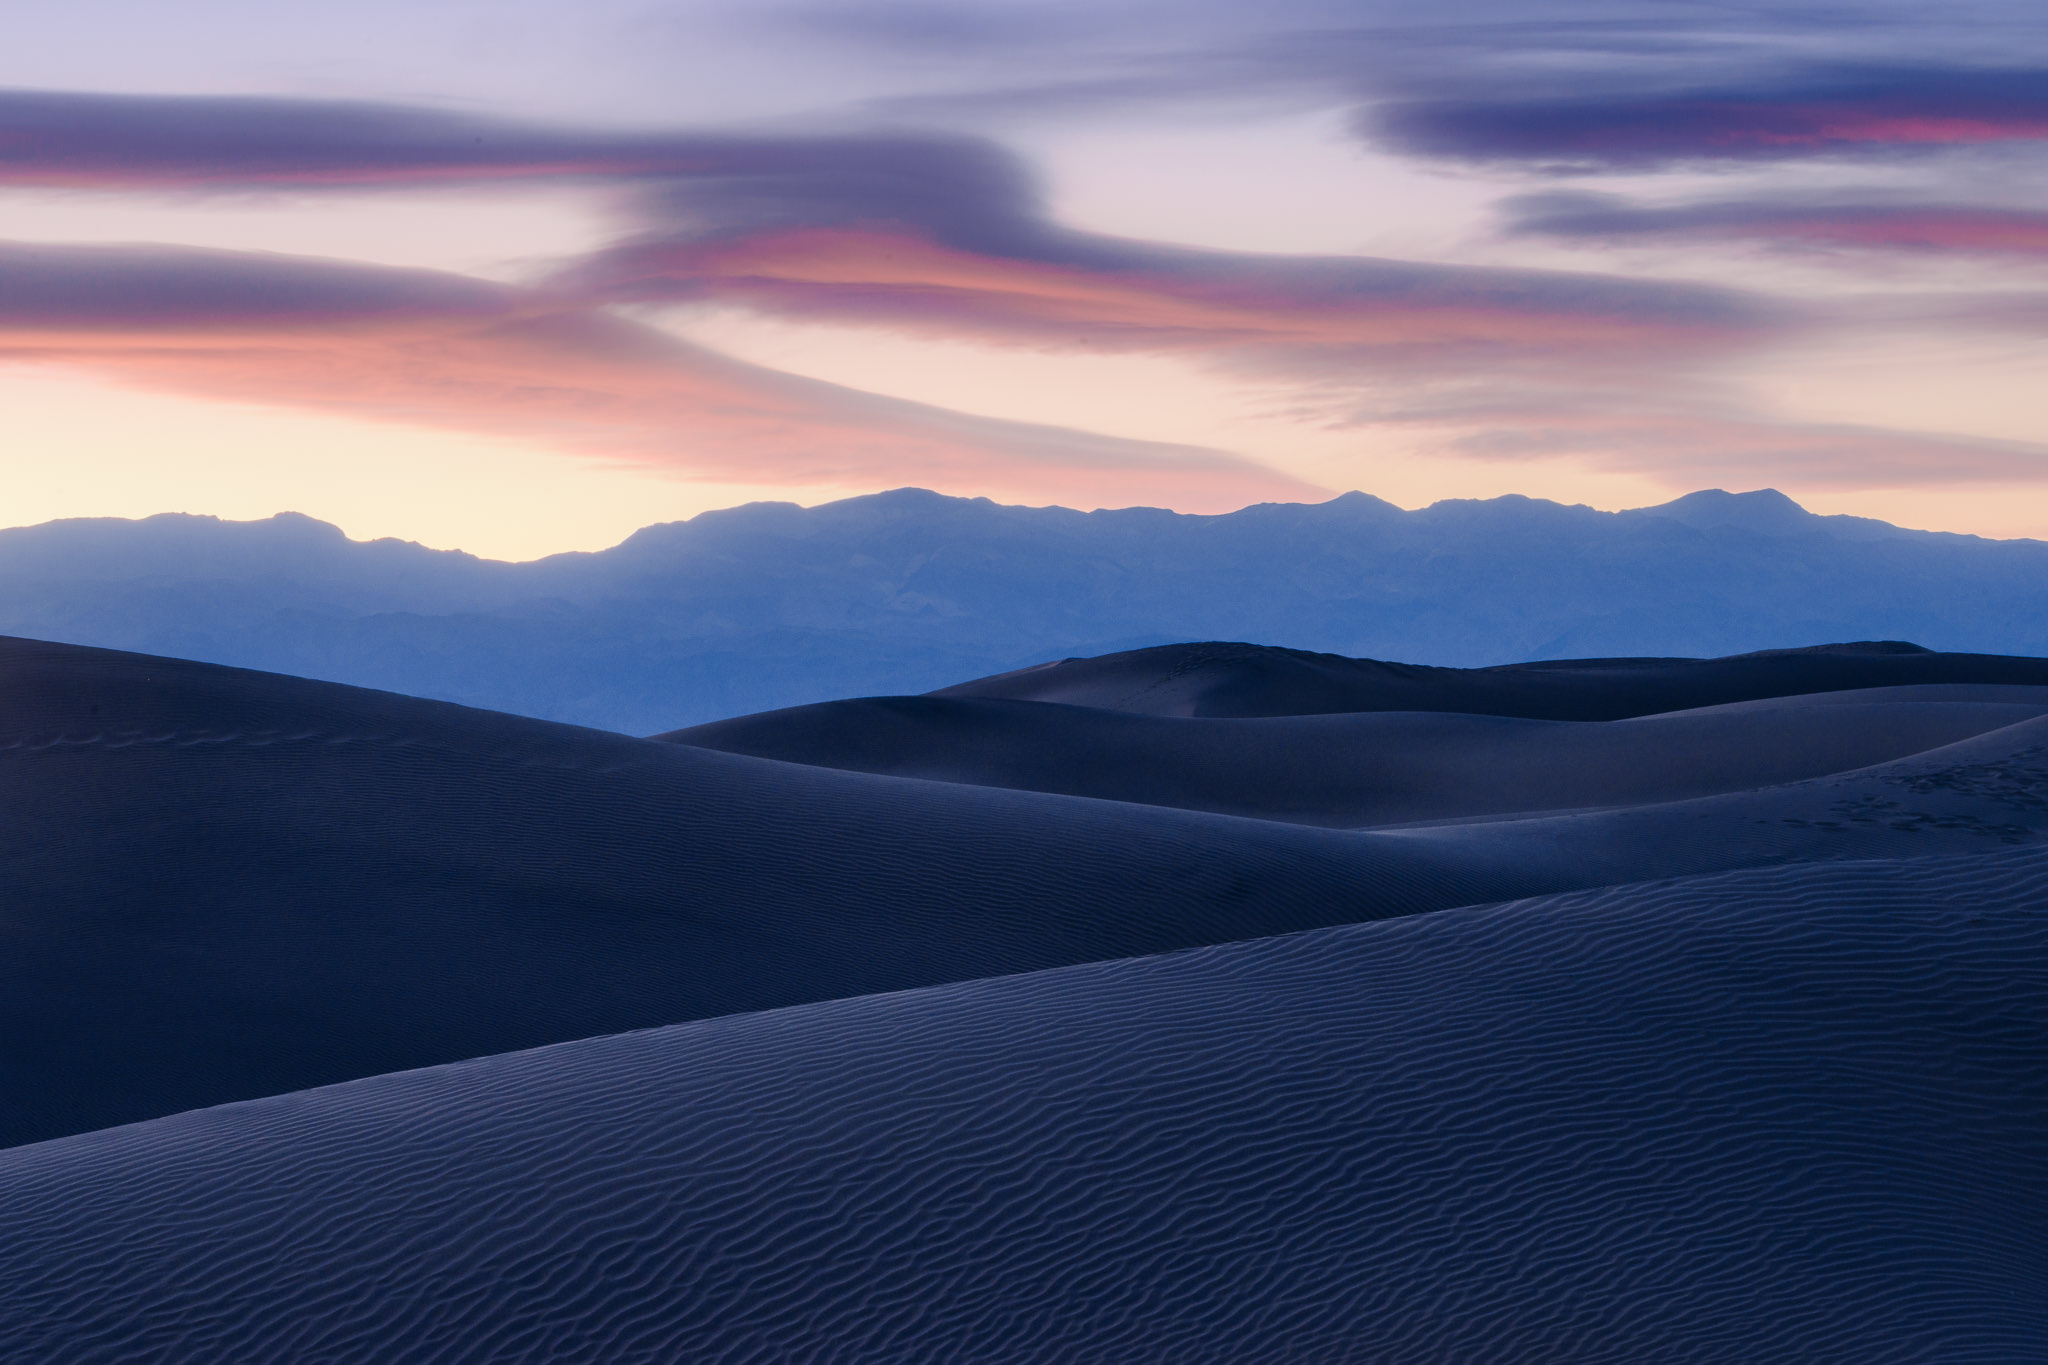 What is Landscape Photography? Landscape Photography Definition